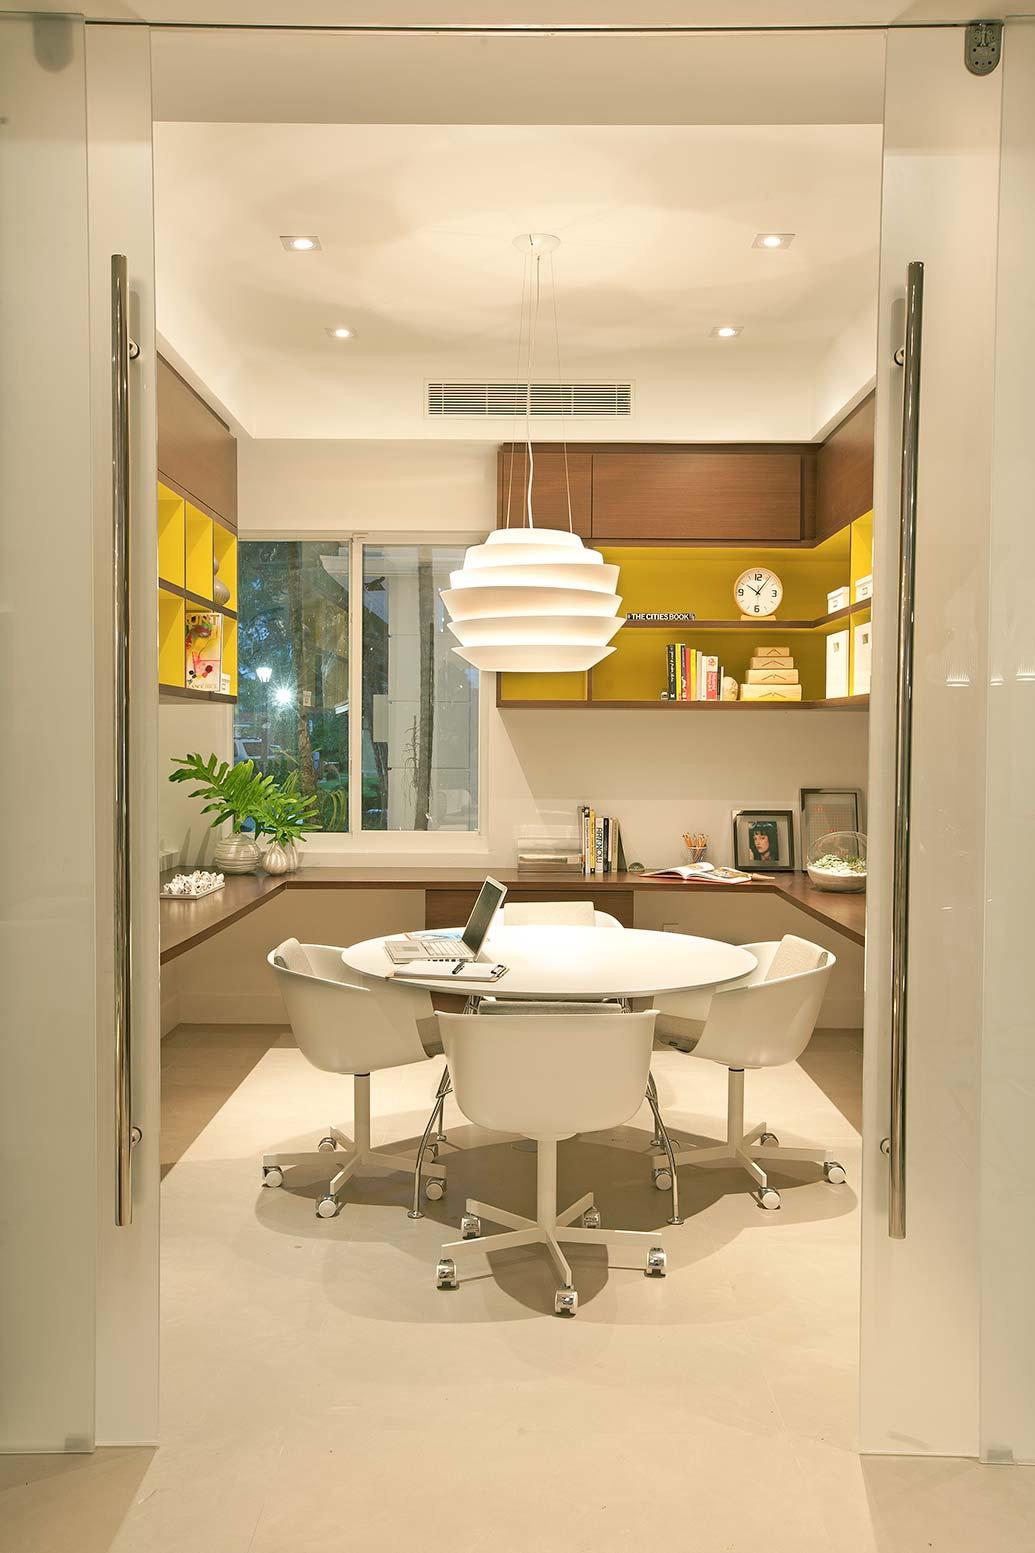 ypes of Lighting in Modern Interior Design - esidential Interior ... - ^